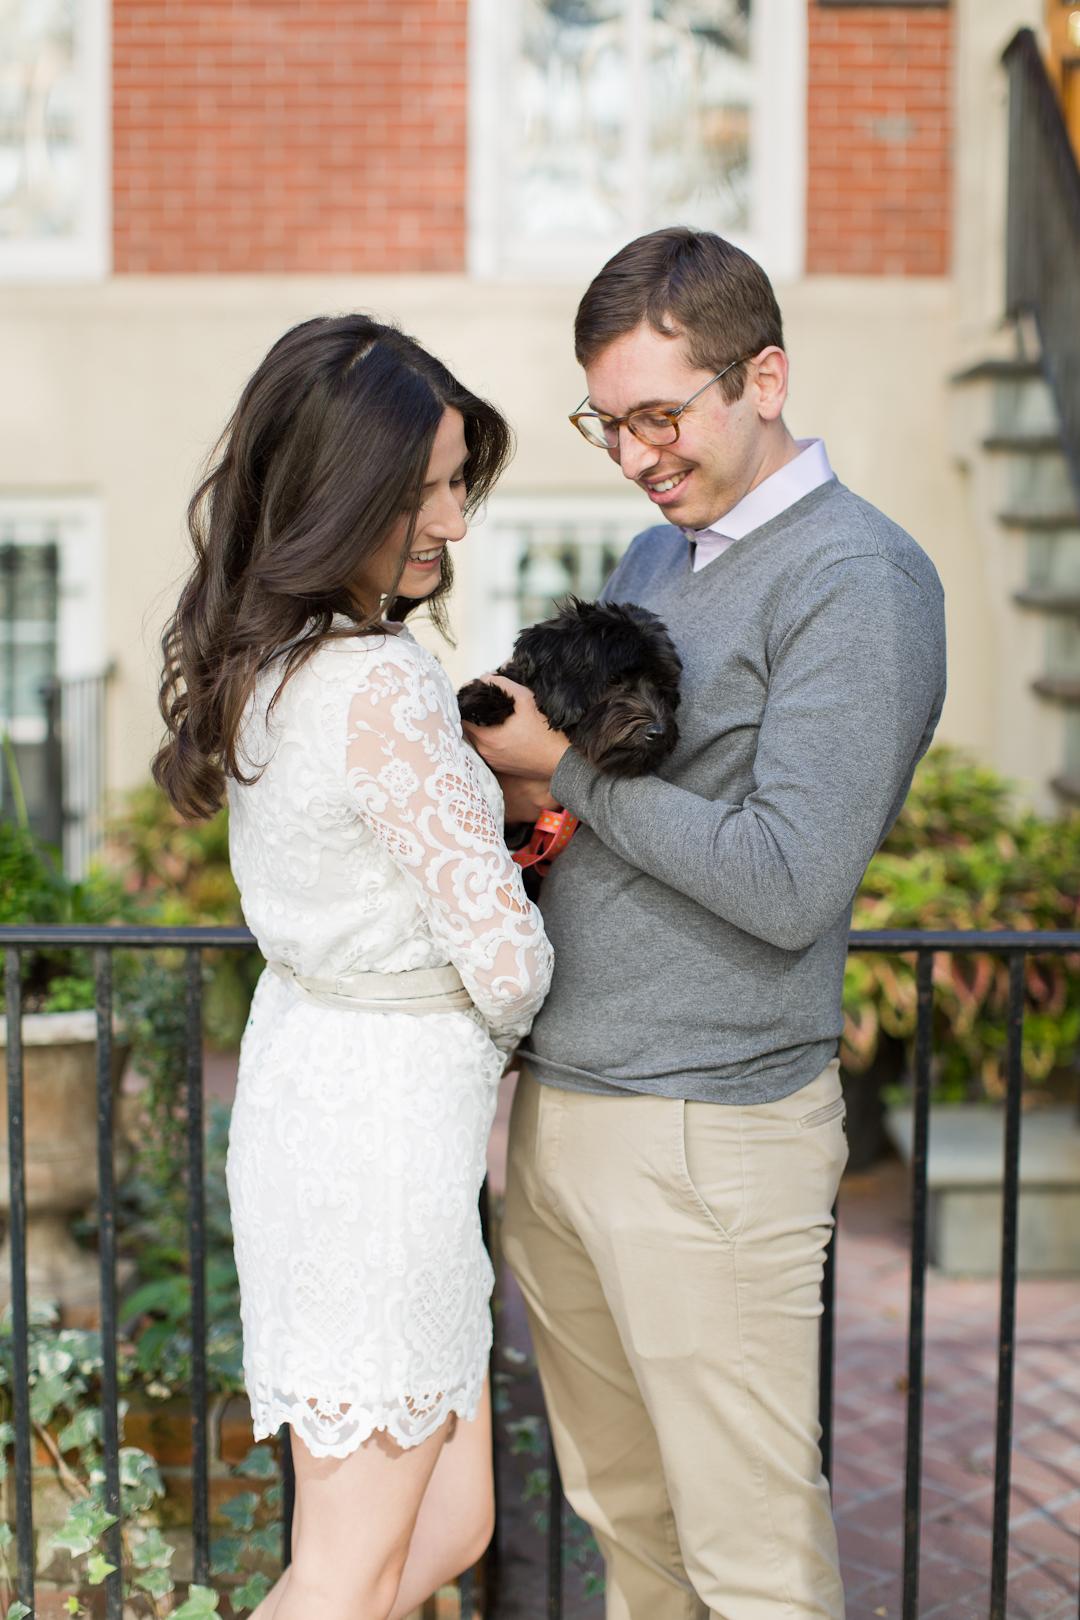 Melissa Kruse Photography - Christina & Alex Kips Bay Engagement Photos-8.jpg